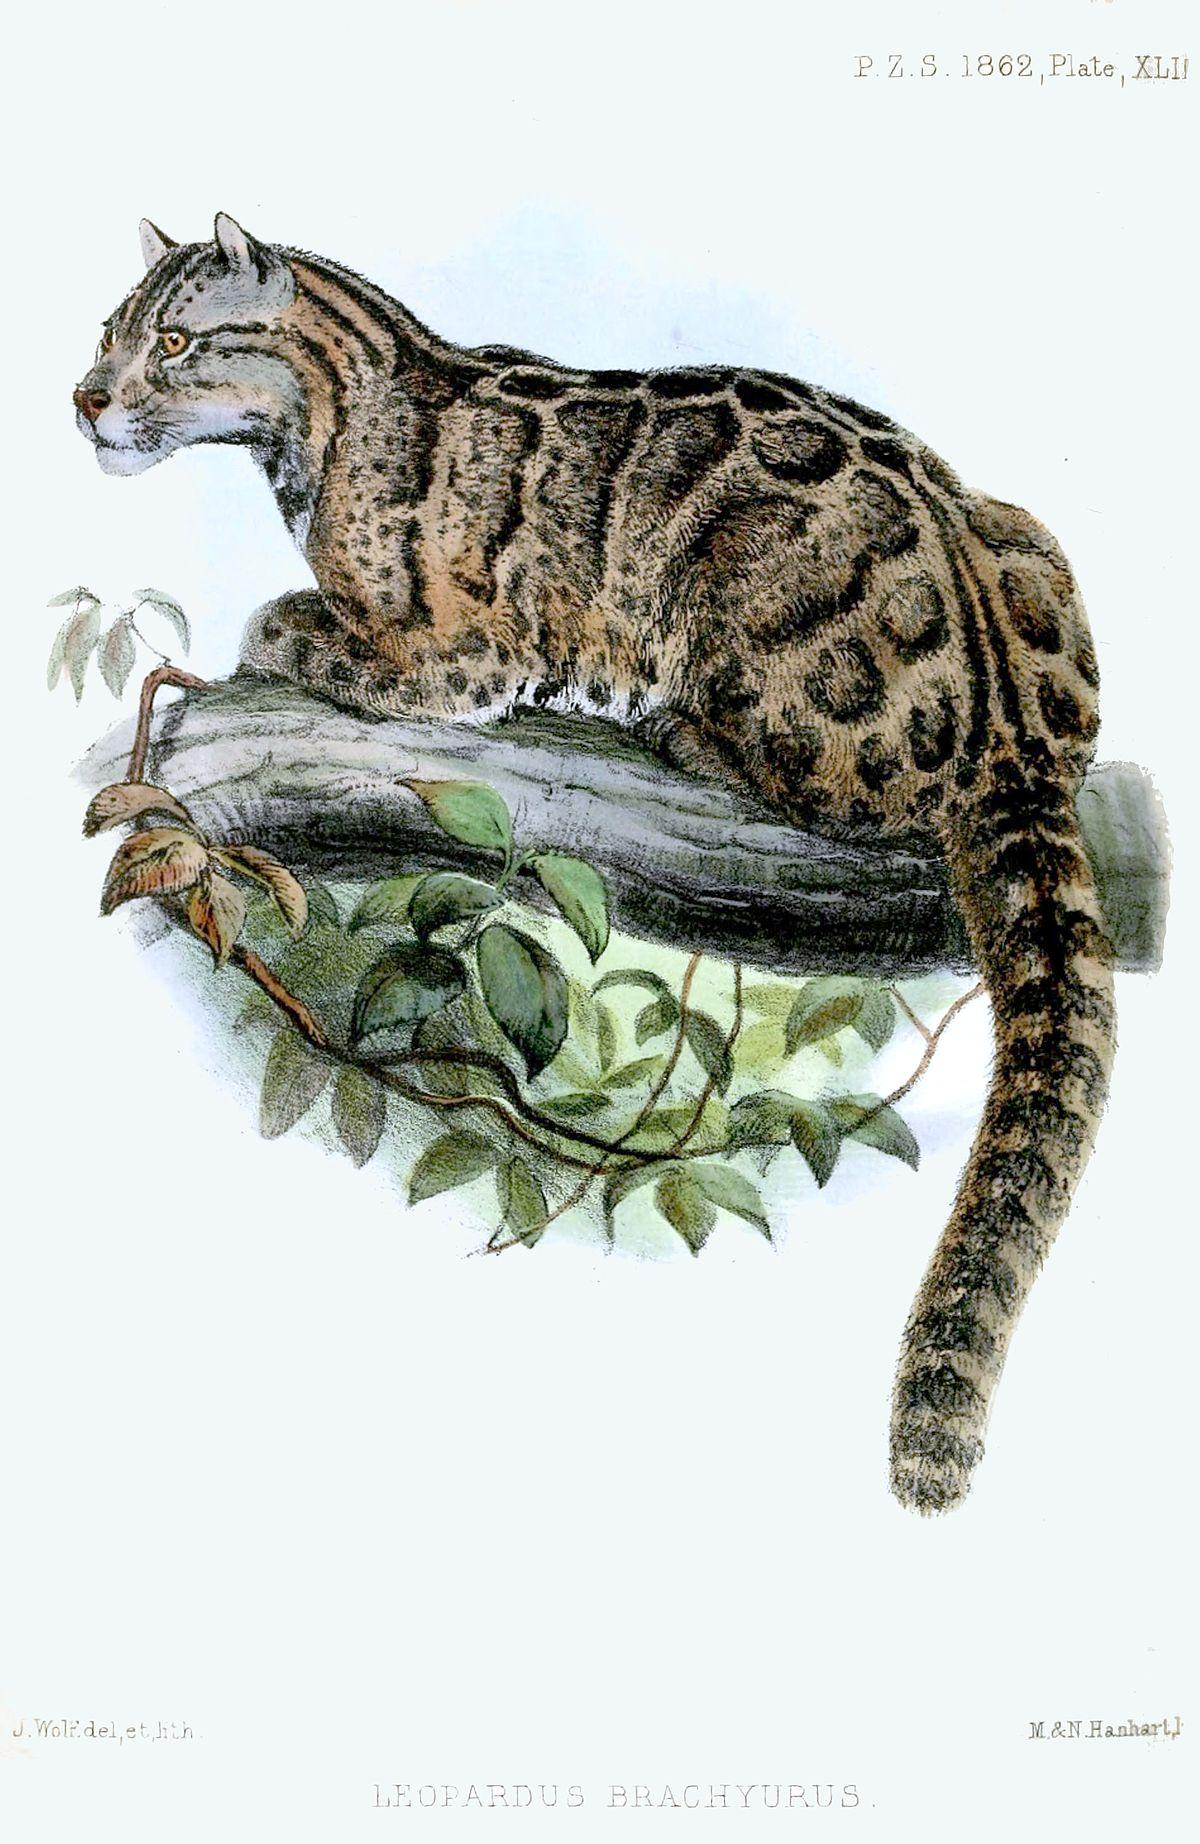 Formosan clouded leopard - Wikipedia - 303.7KB